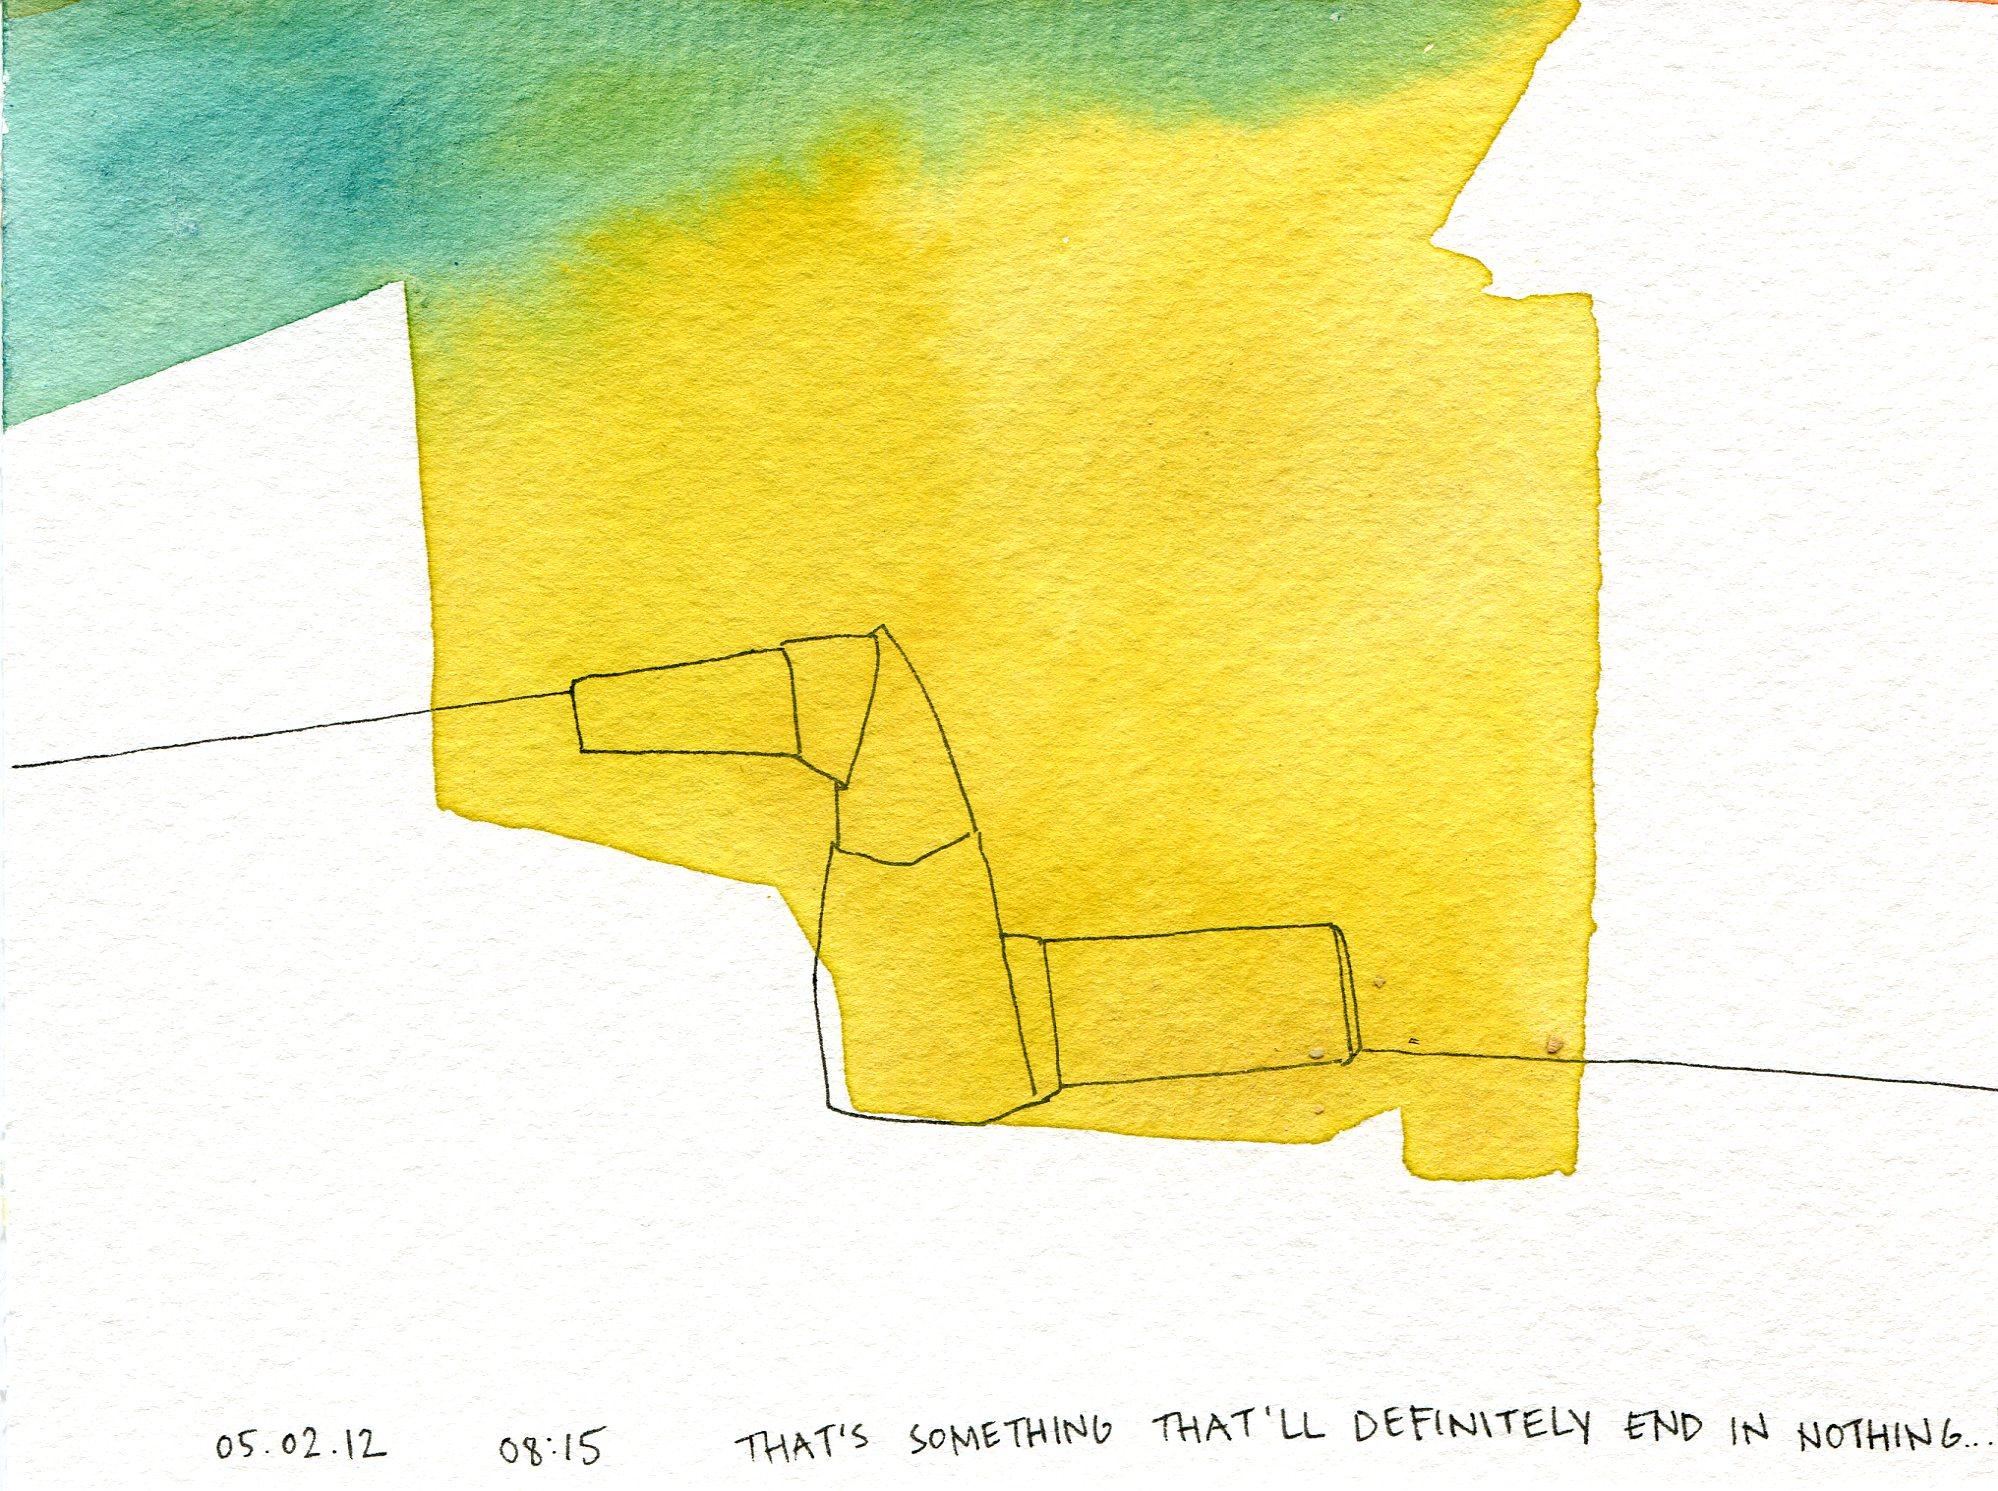 2012-05-05 drawing004.jpg